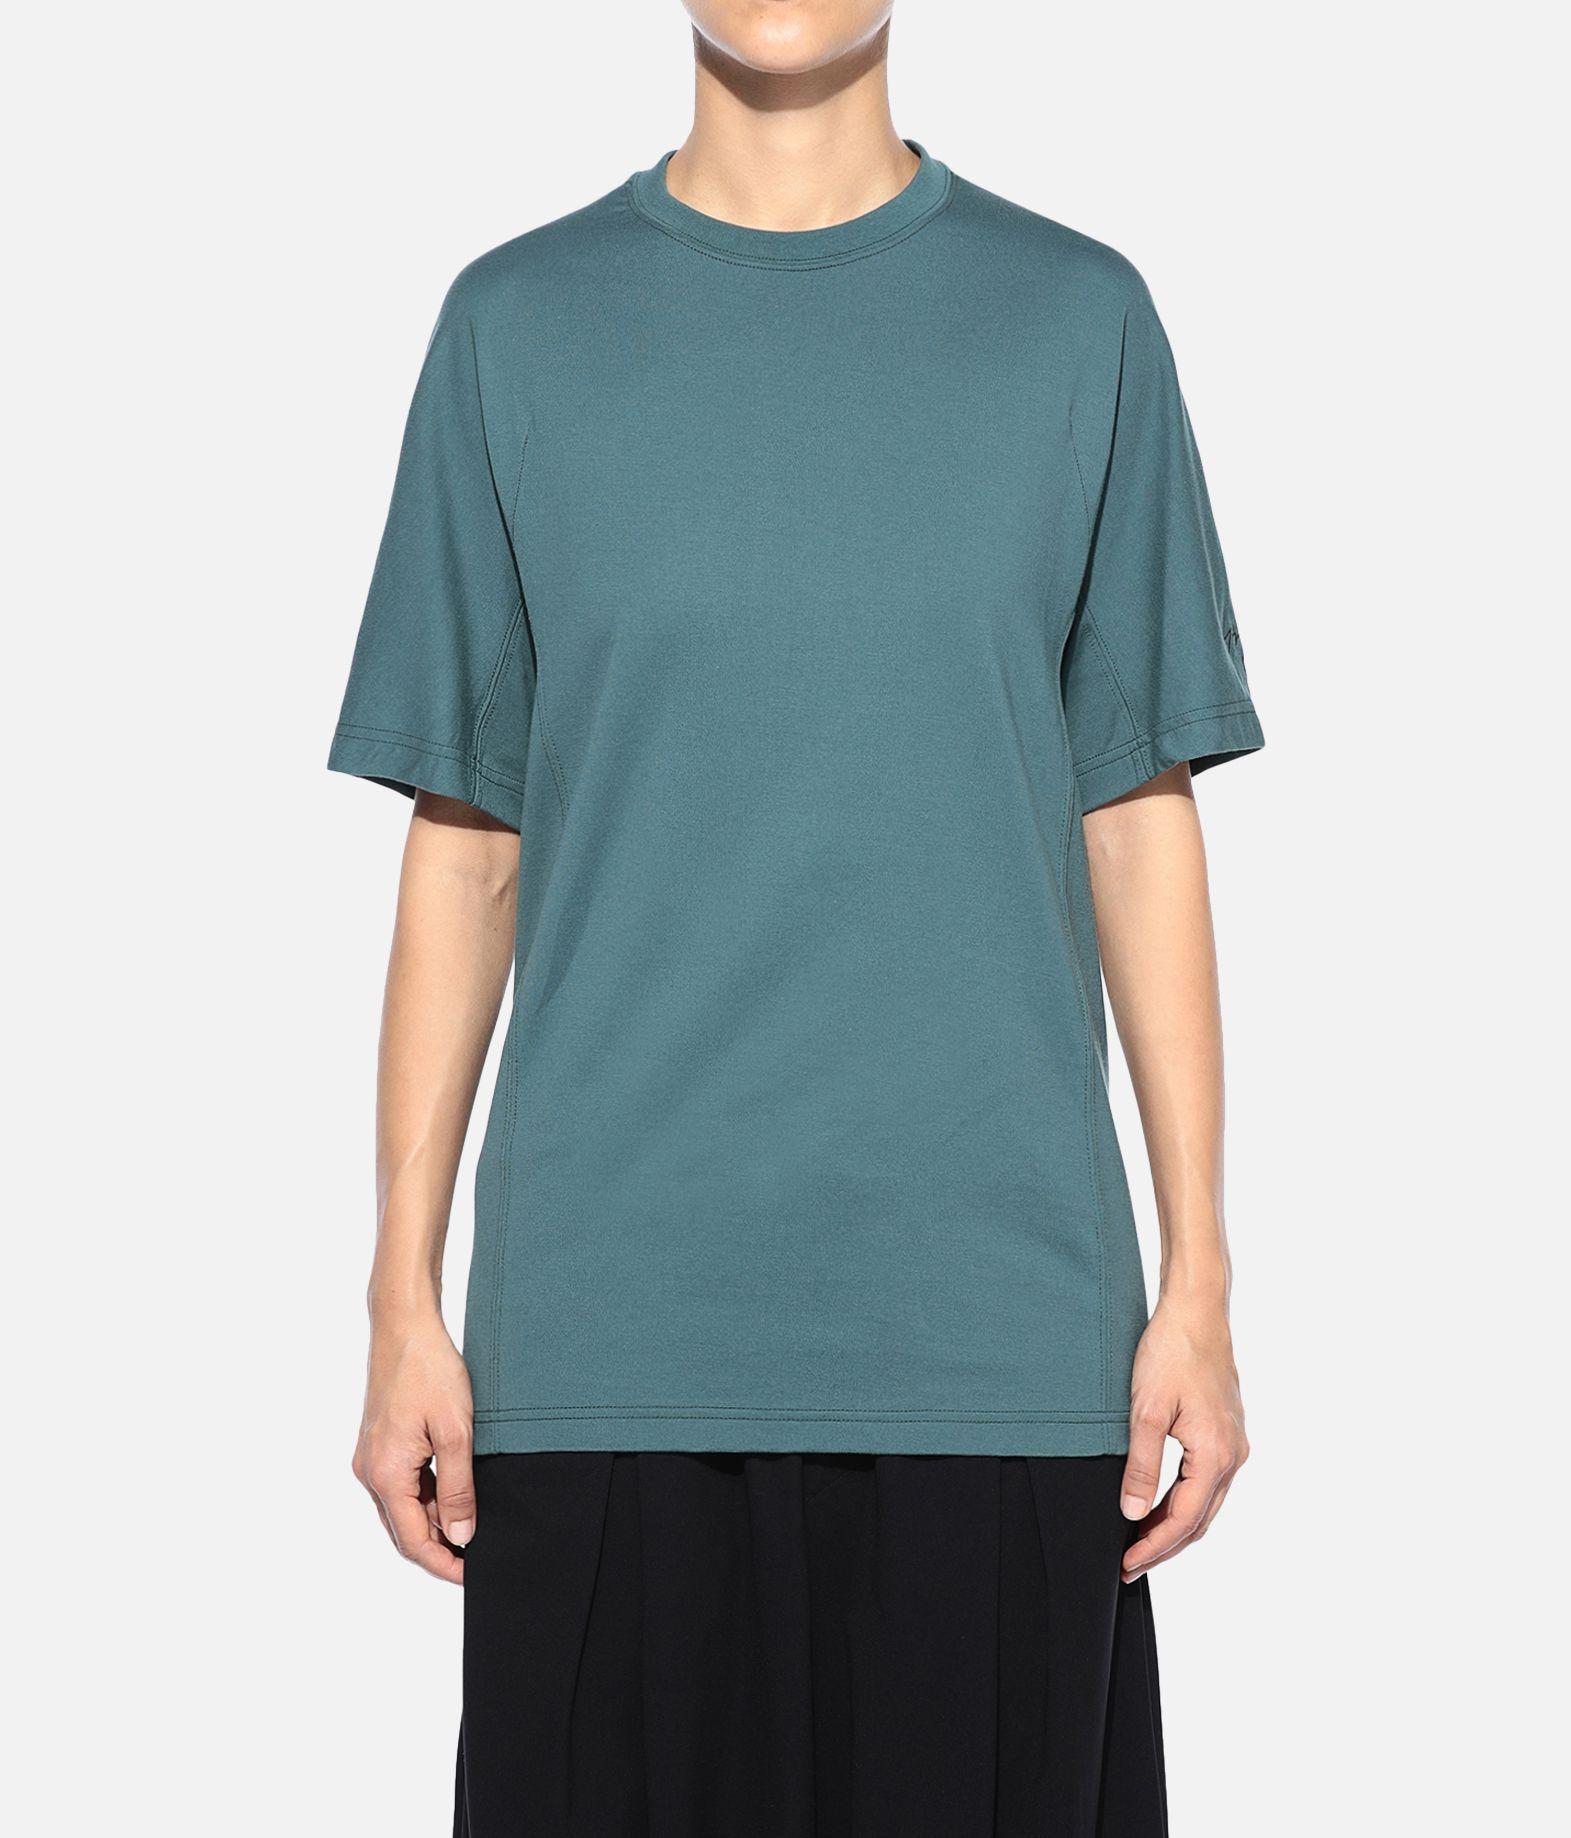 Y-3 Y-3 New Classic Tee  Kurzärmliges T-shirt Damen r